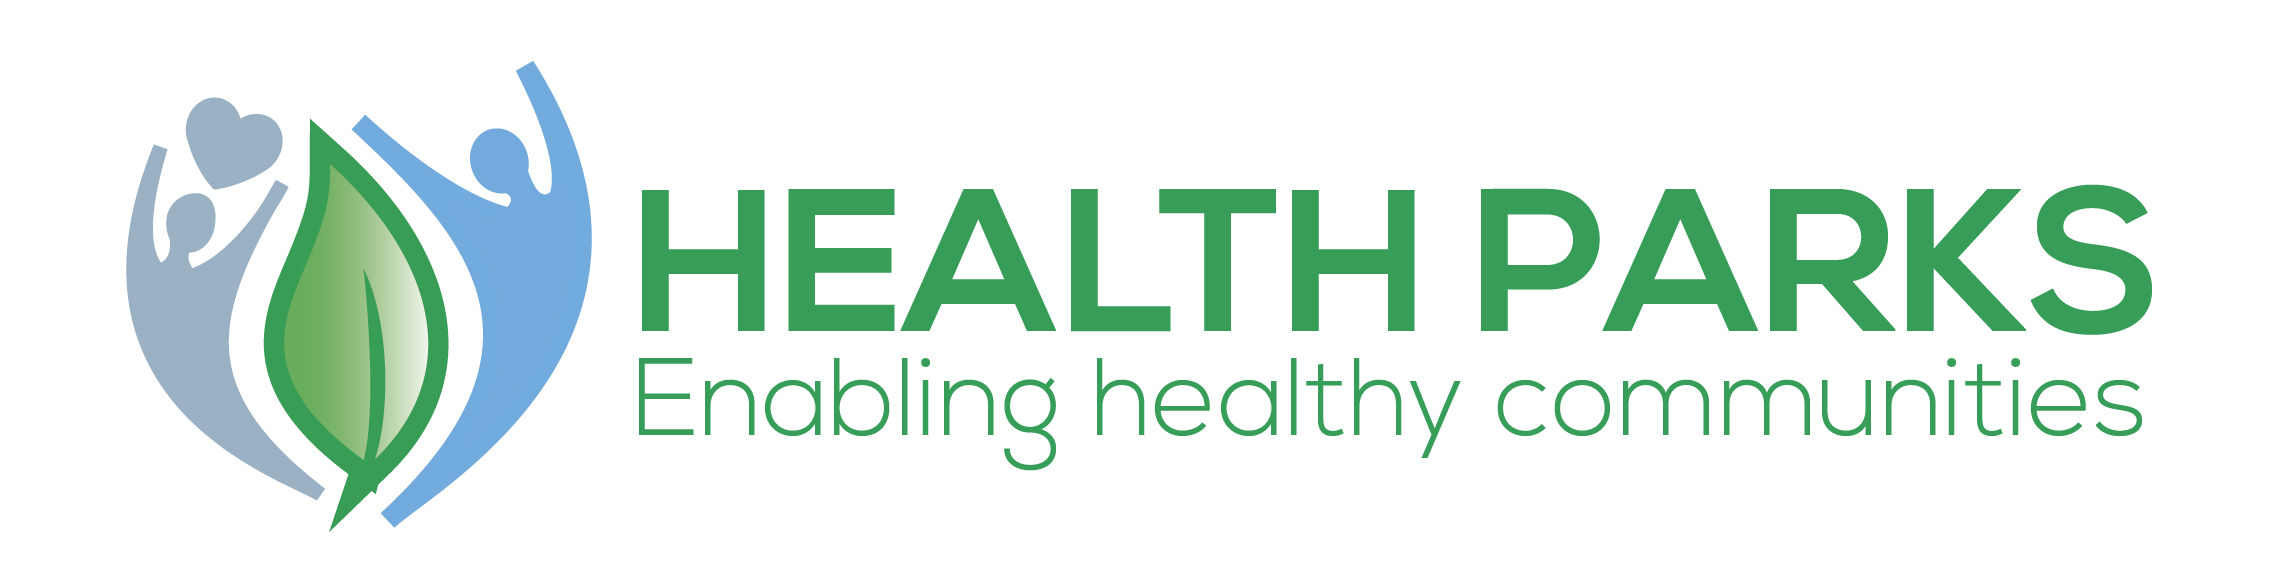 Health Parks Logo FINAL DRAFT-1_colour.jpg